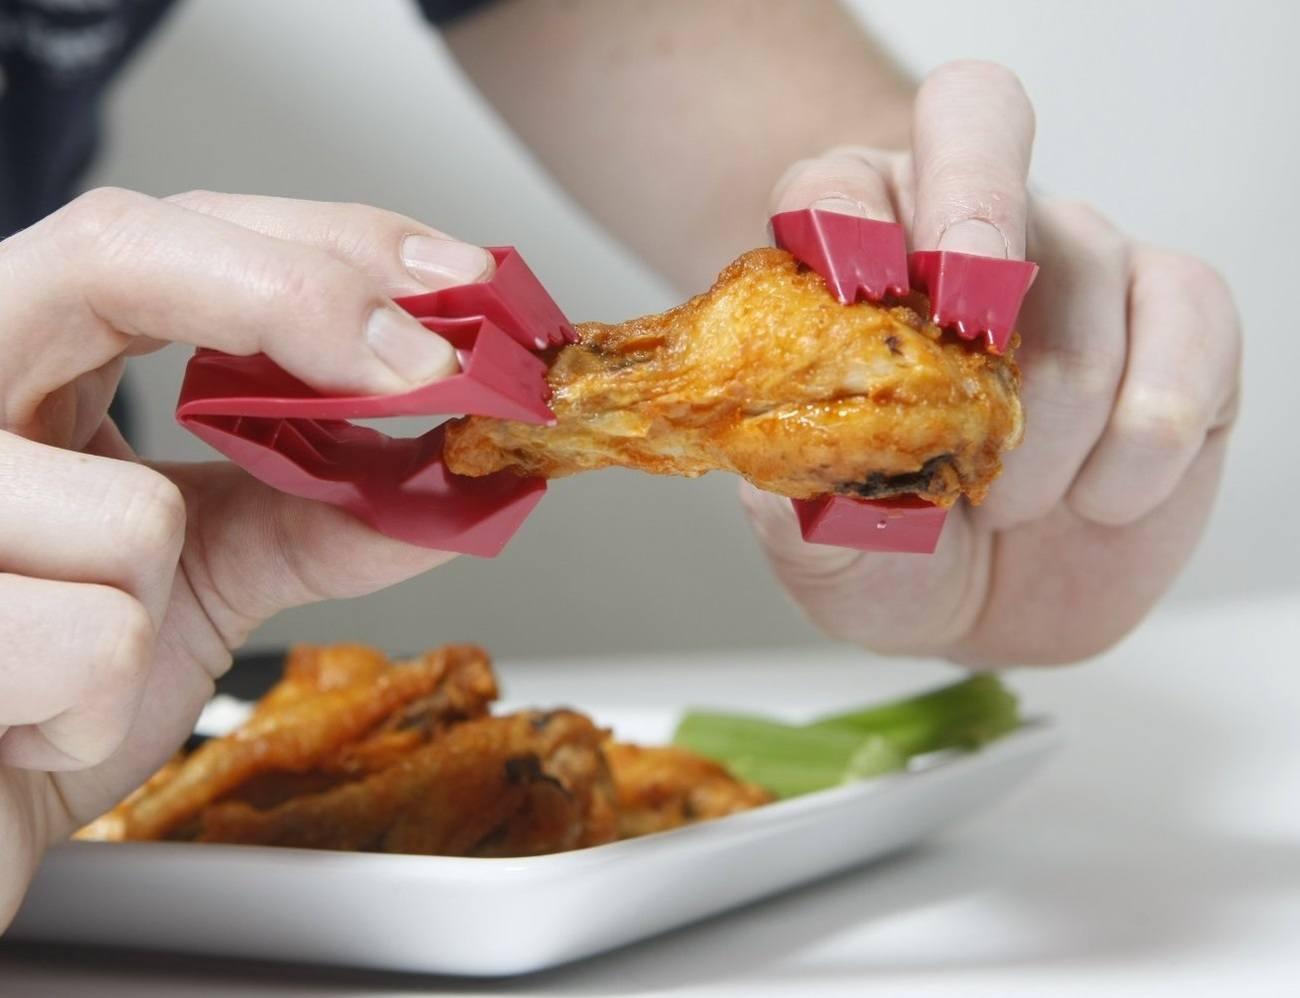 Trongs – Multi-Purpose Finger Food Utensils